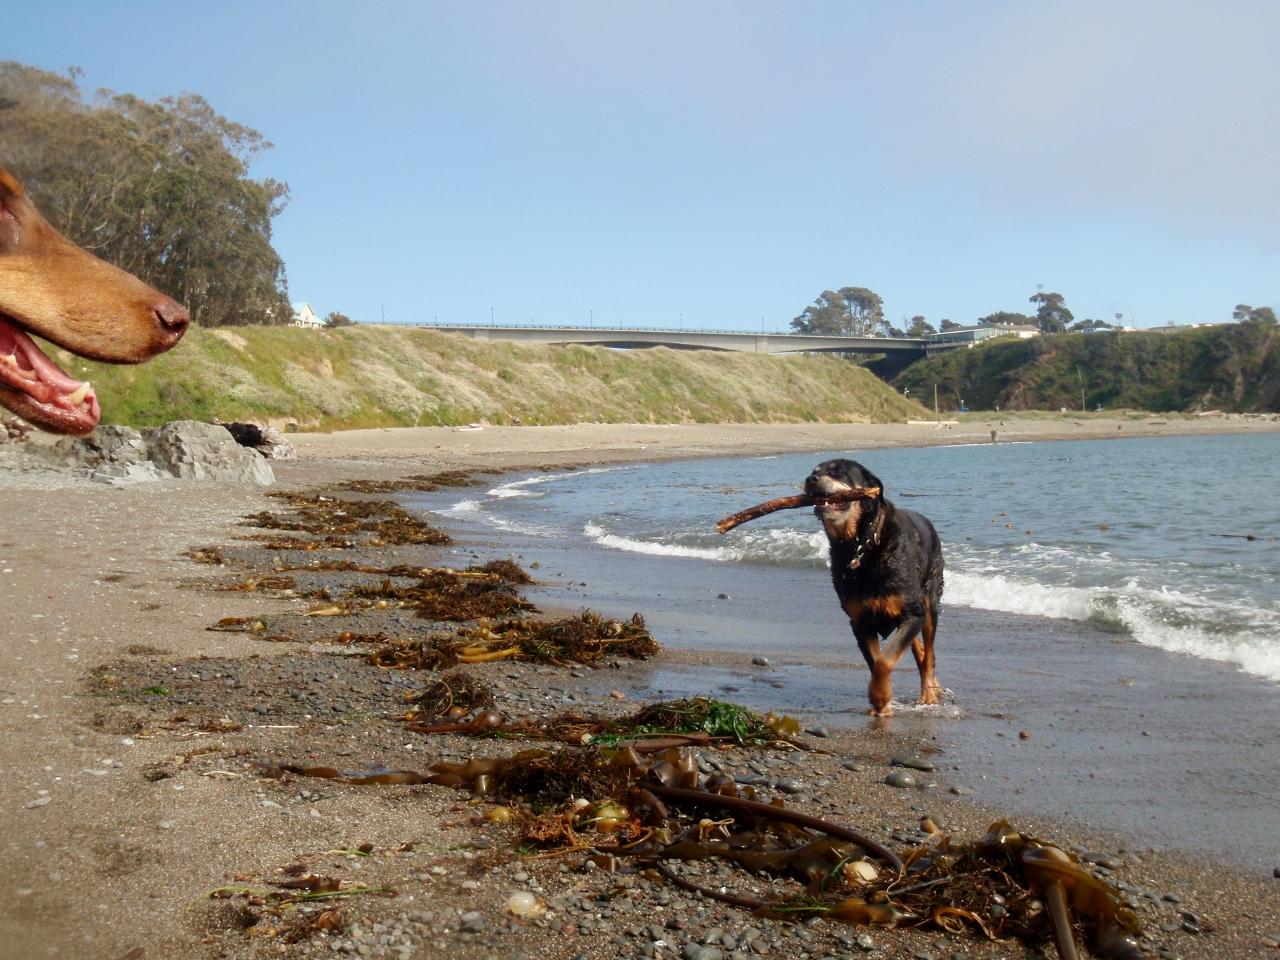 Dogs at play at Noyo Off-Leash Dog Beach.